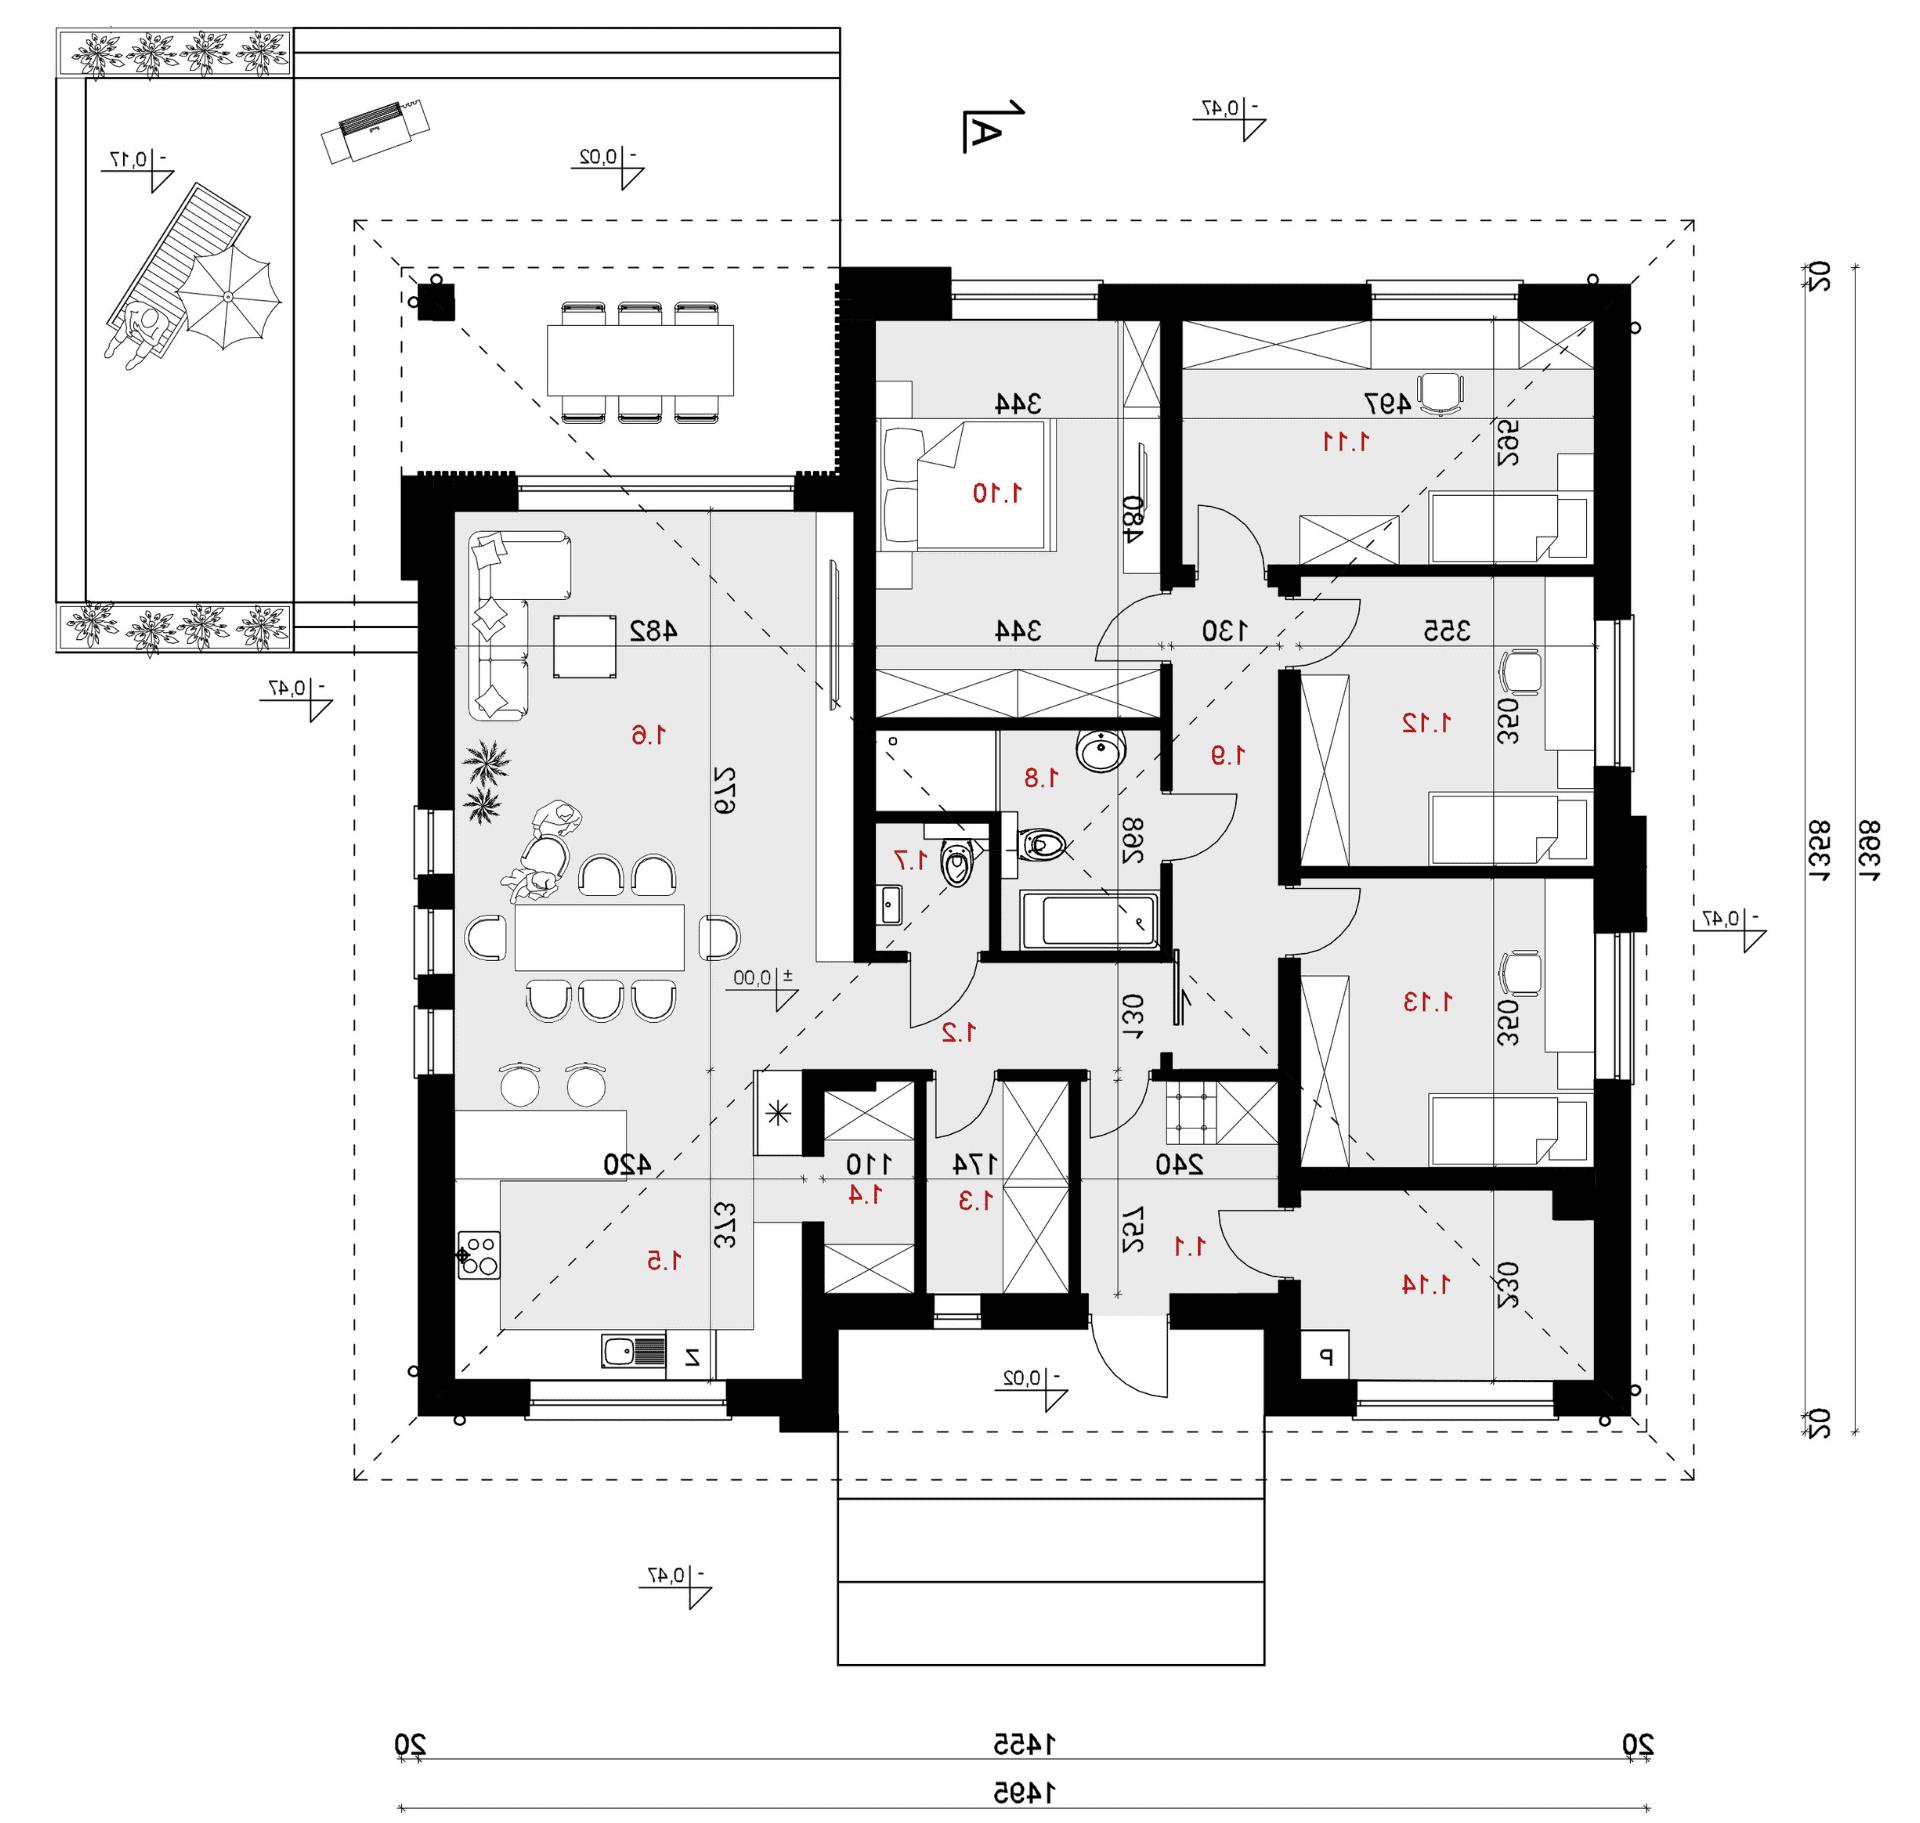 Rzut parteru - projekt domu SEJ-PRO 071/1 ENERGO - odbicie lustrzane